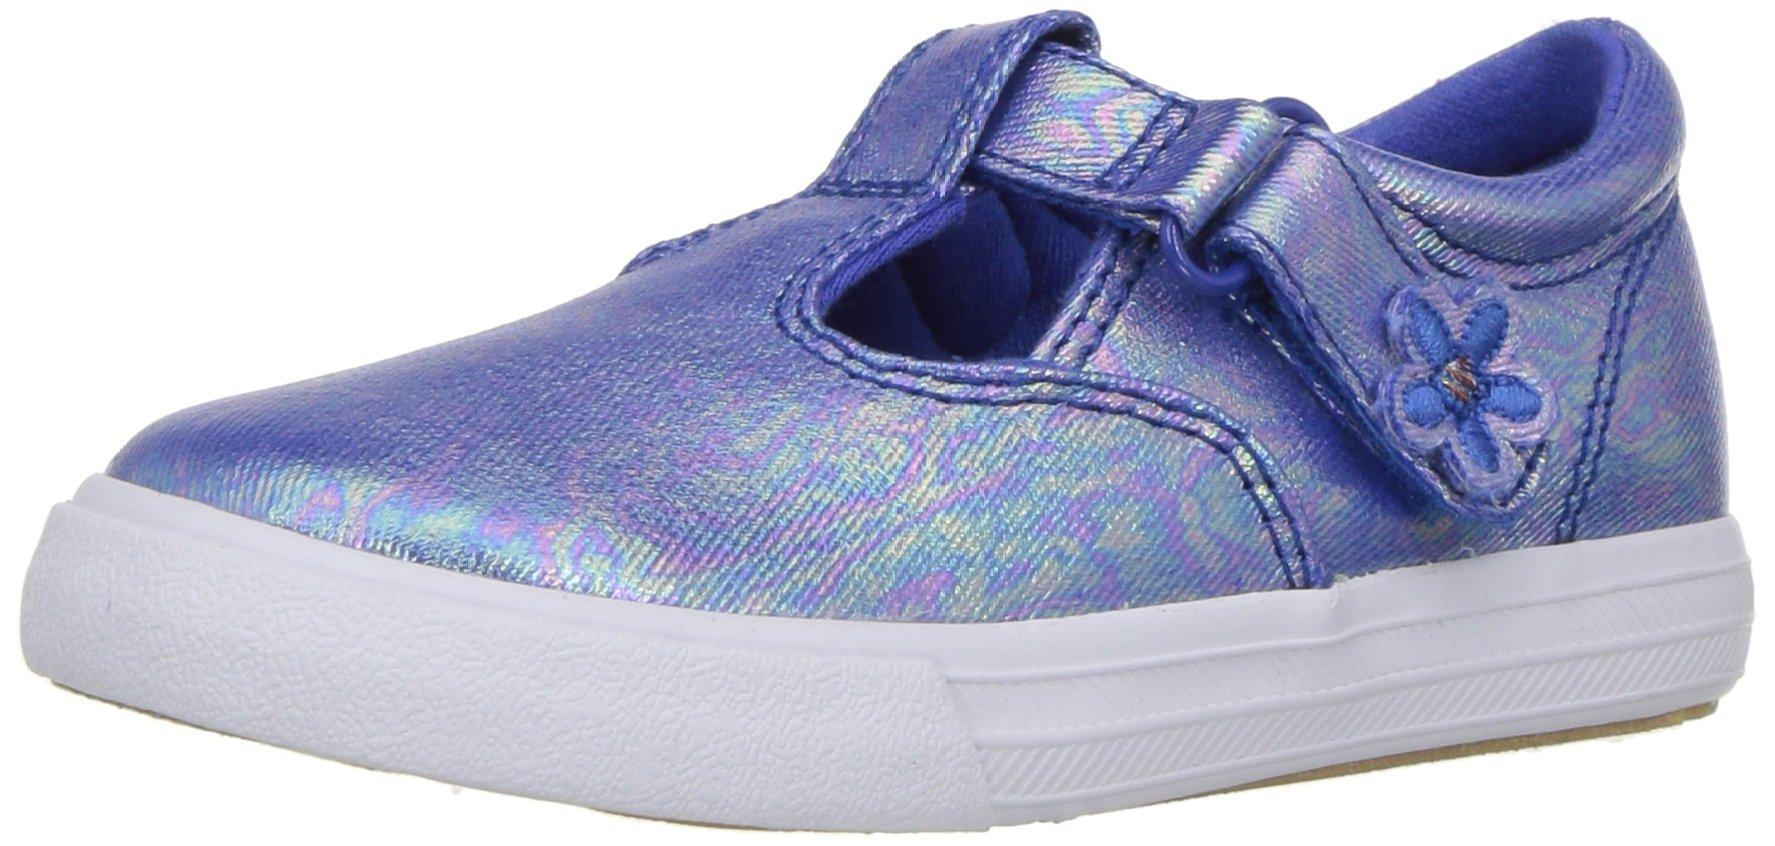 Keds Daphne T-Strap Sneaker (Toddler/Little Kid), Blue Iridescent, 12 M US Little Kid